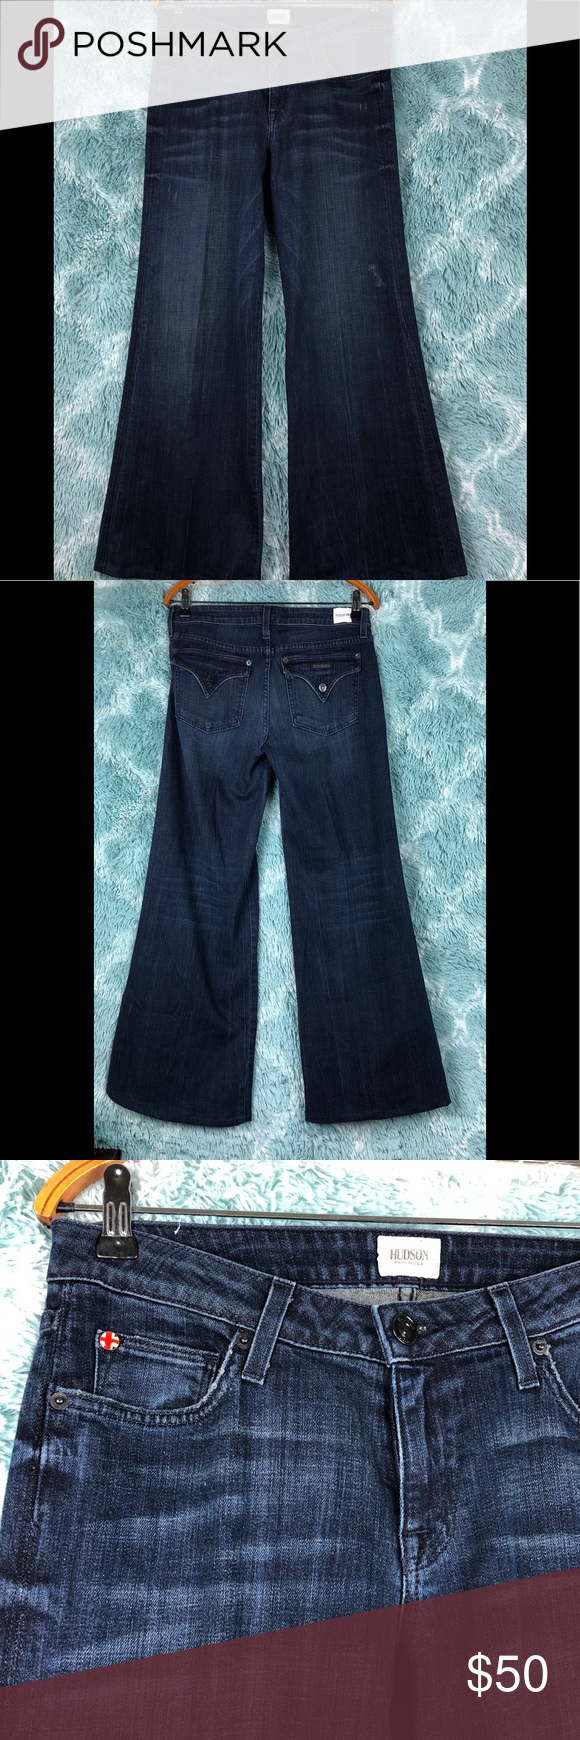 38253912677 Hudson Woodstock Flare Wide Leg 5 pockets dark blue bellbottom. No holes or  stains 104F Hudson Jeans Jeans Flare   Wide Leg